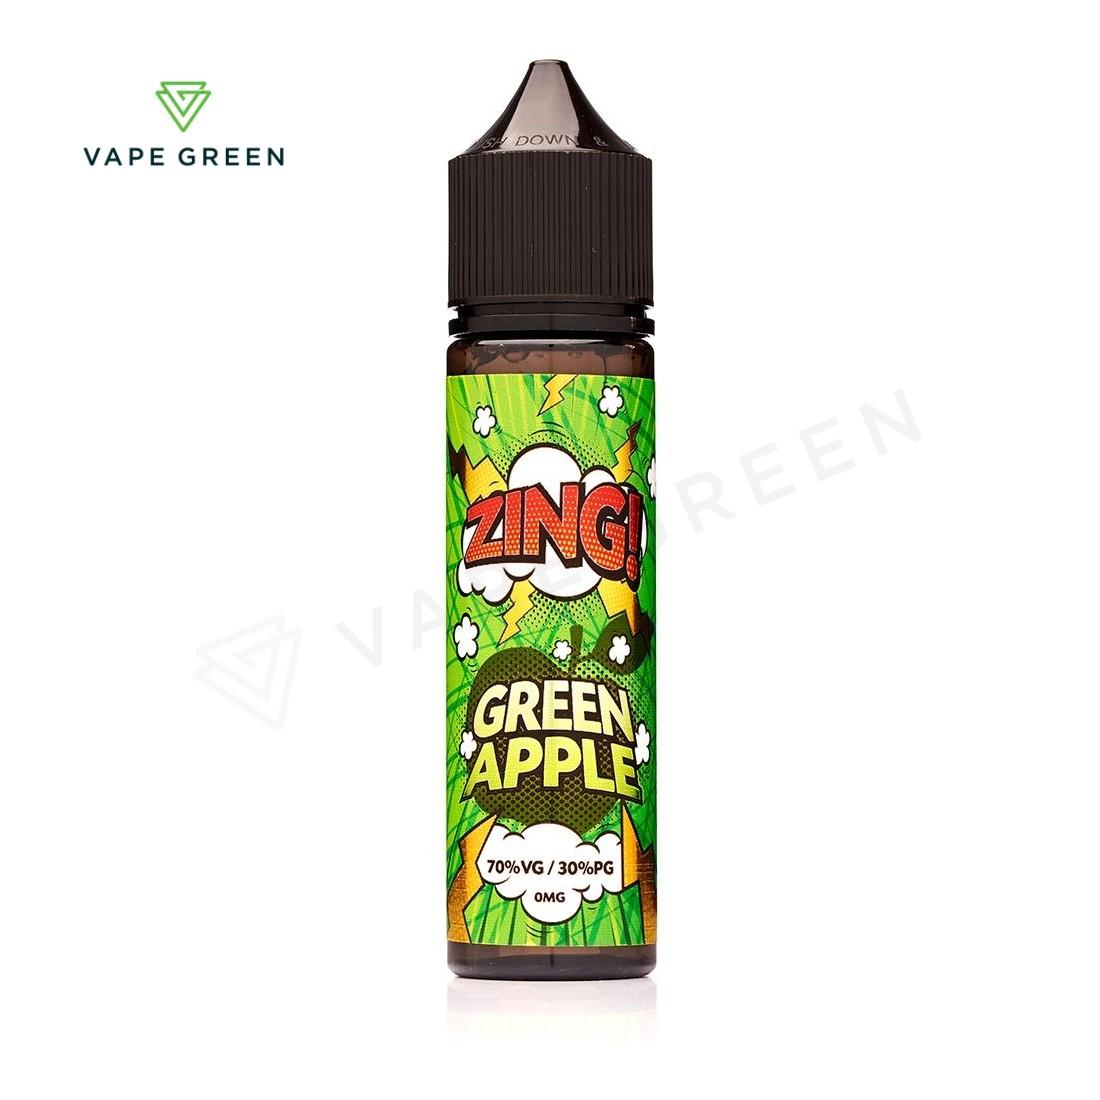 Green Apple E-liquid by Zing! 50ml